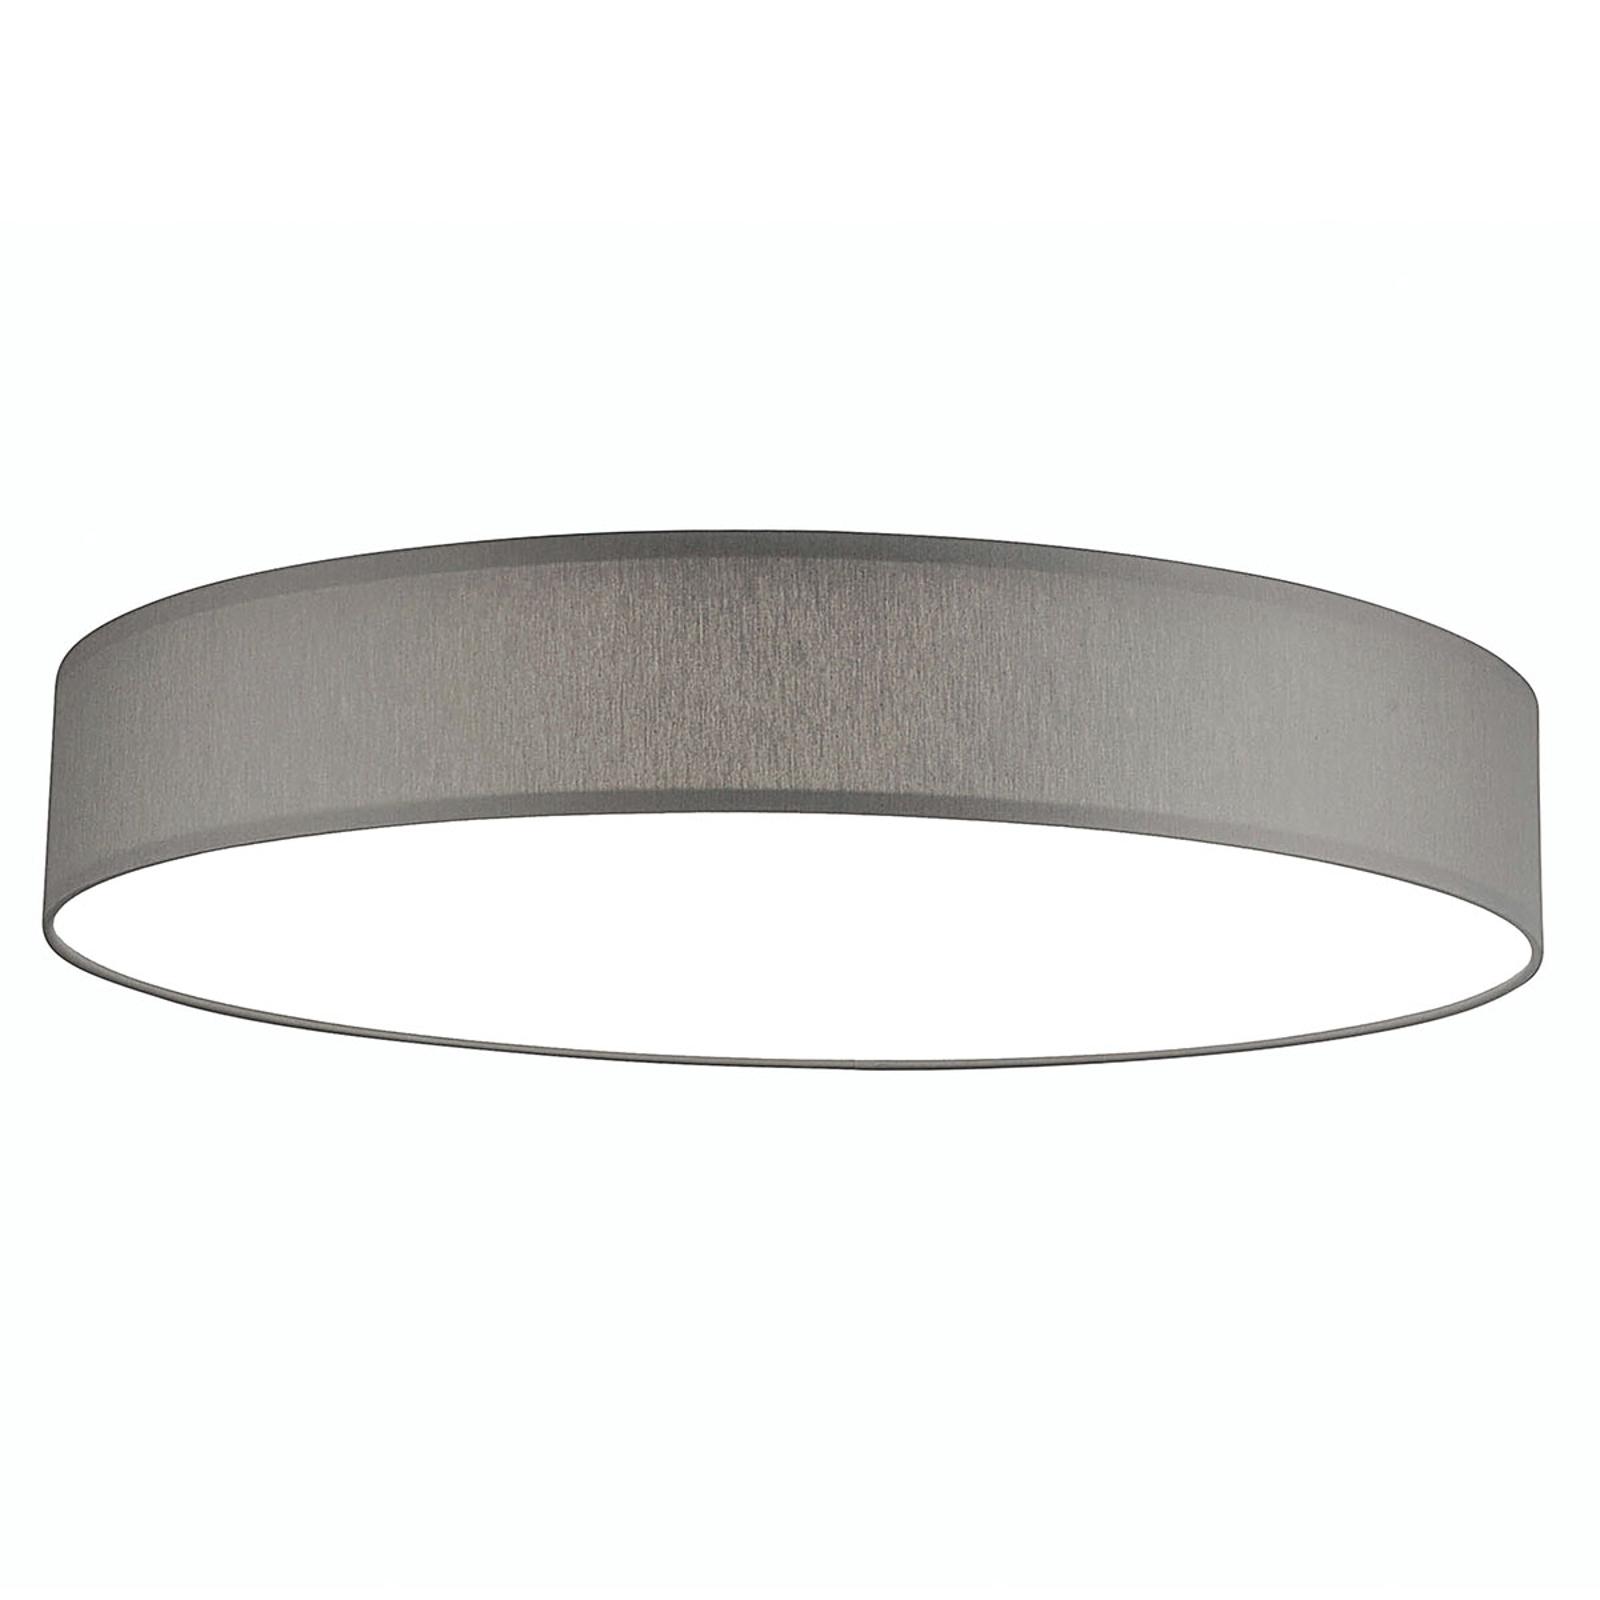 LED plafondlamp Luno XL 3.000K 100 W lichtgrijs